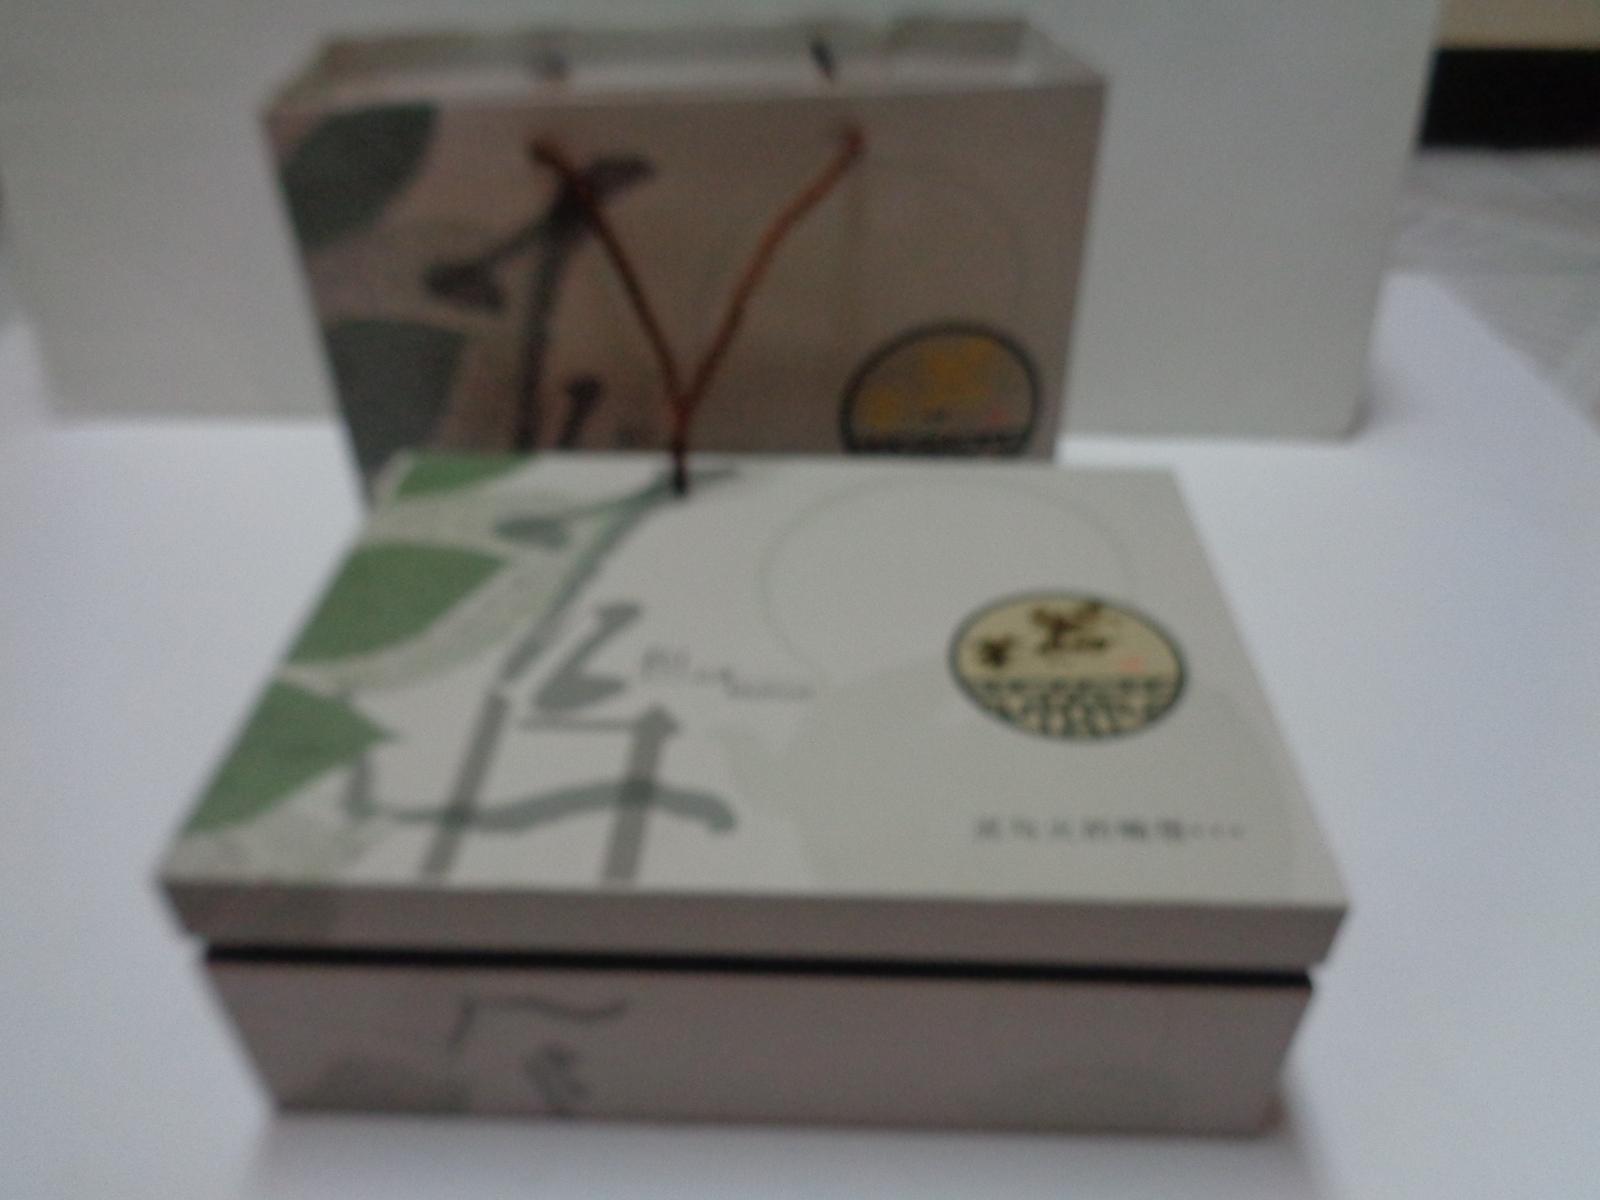 Porcelain China Tea Set Teapot Filter Cups New in Box Rare Wuxi China